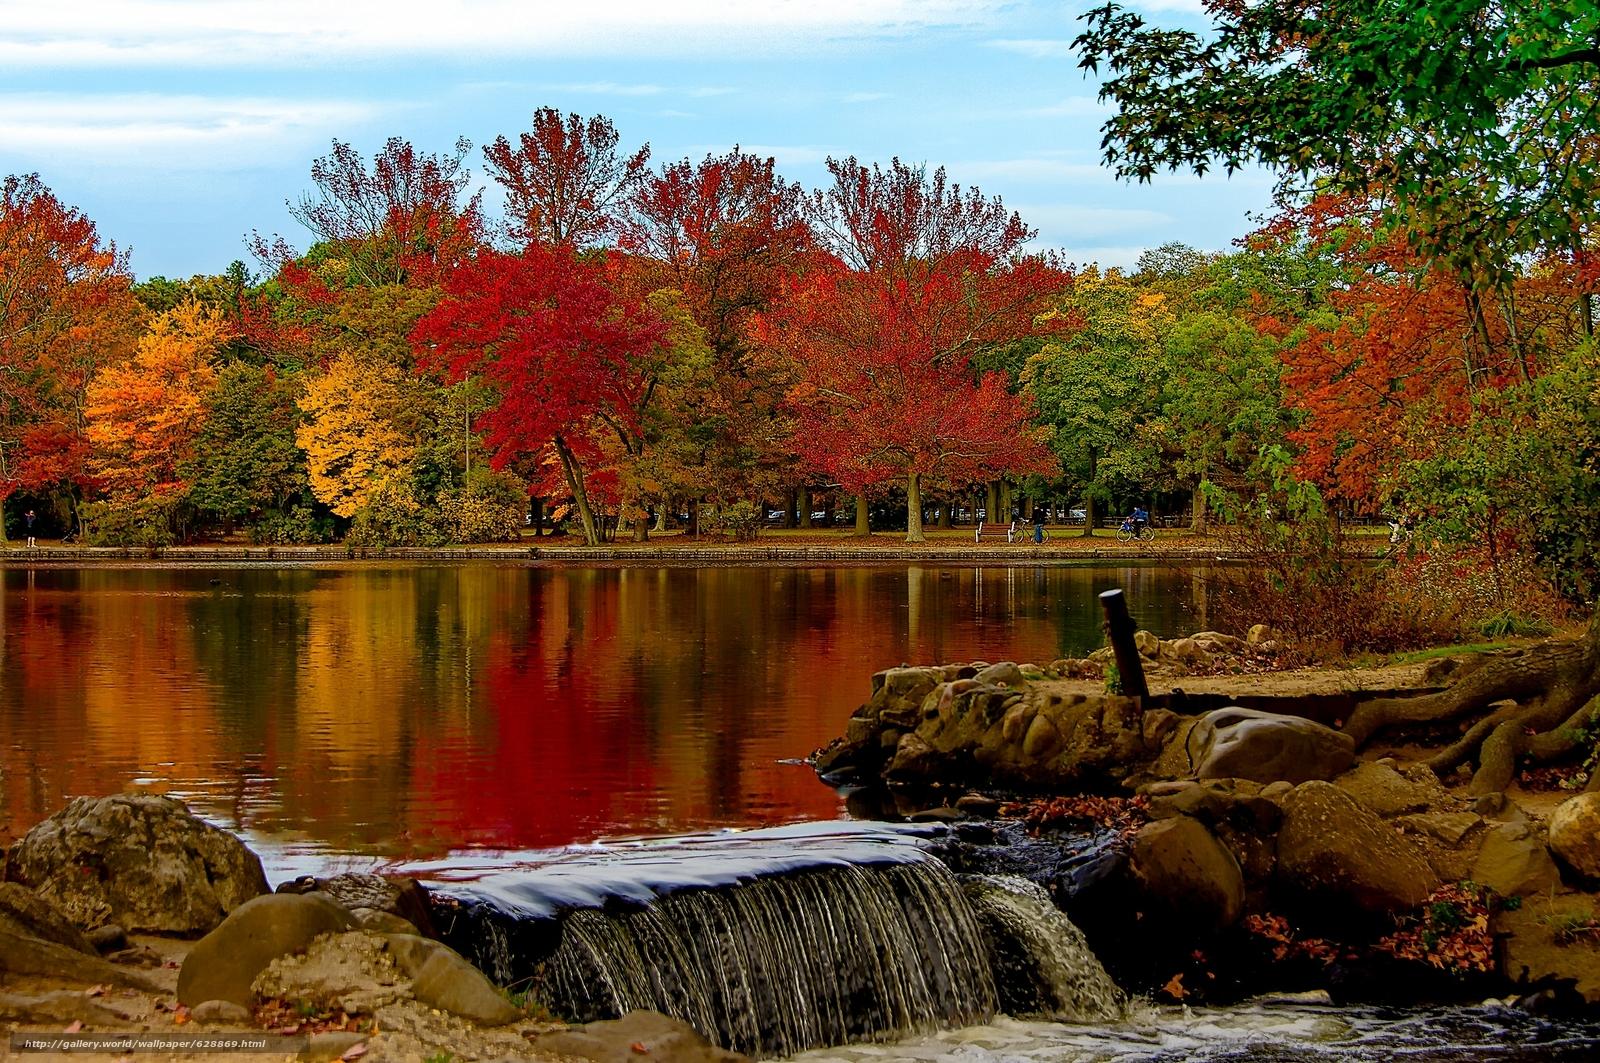 Belmont Lake, Belmont Lake State Park, Babylon, New York, Озеро Белмонт, Вавилон, штат Нью-Йорк, парк, осень, озеро, деревья